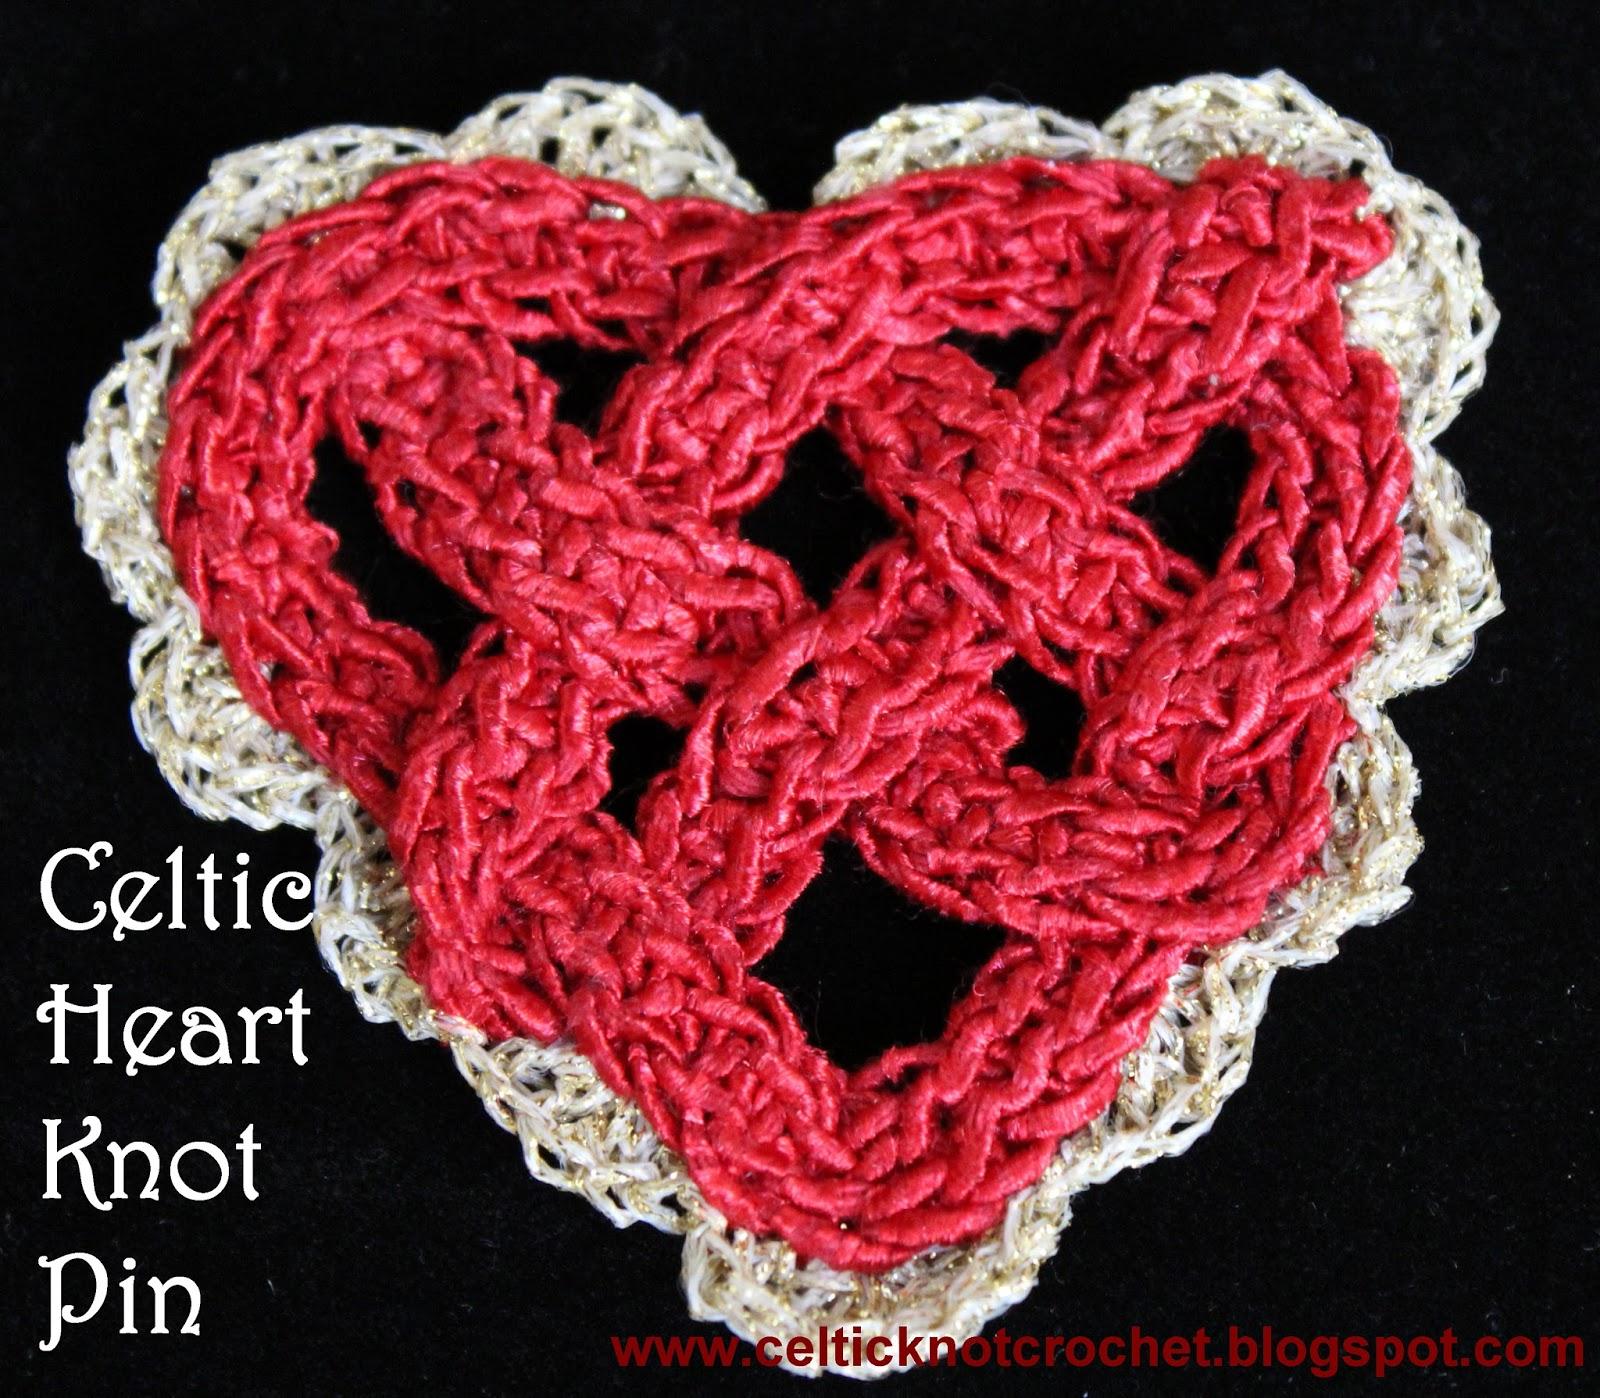 Celtic Heart Knot Pin Celtic Knot Crochet